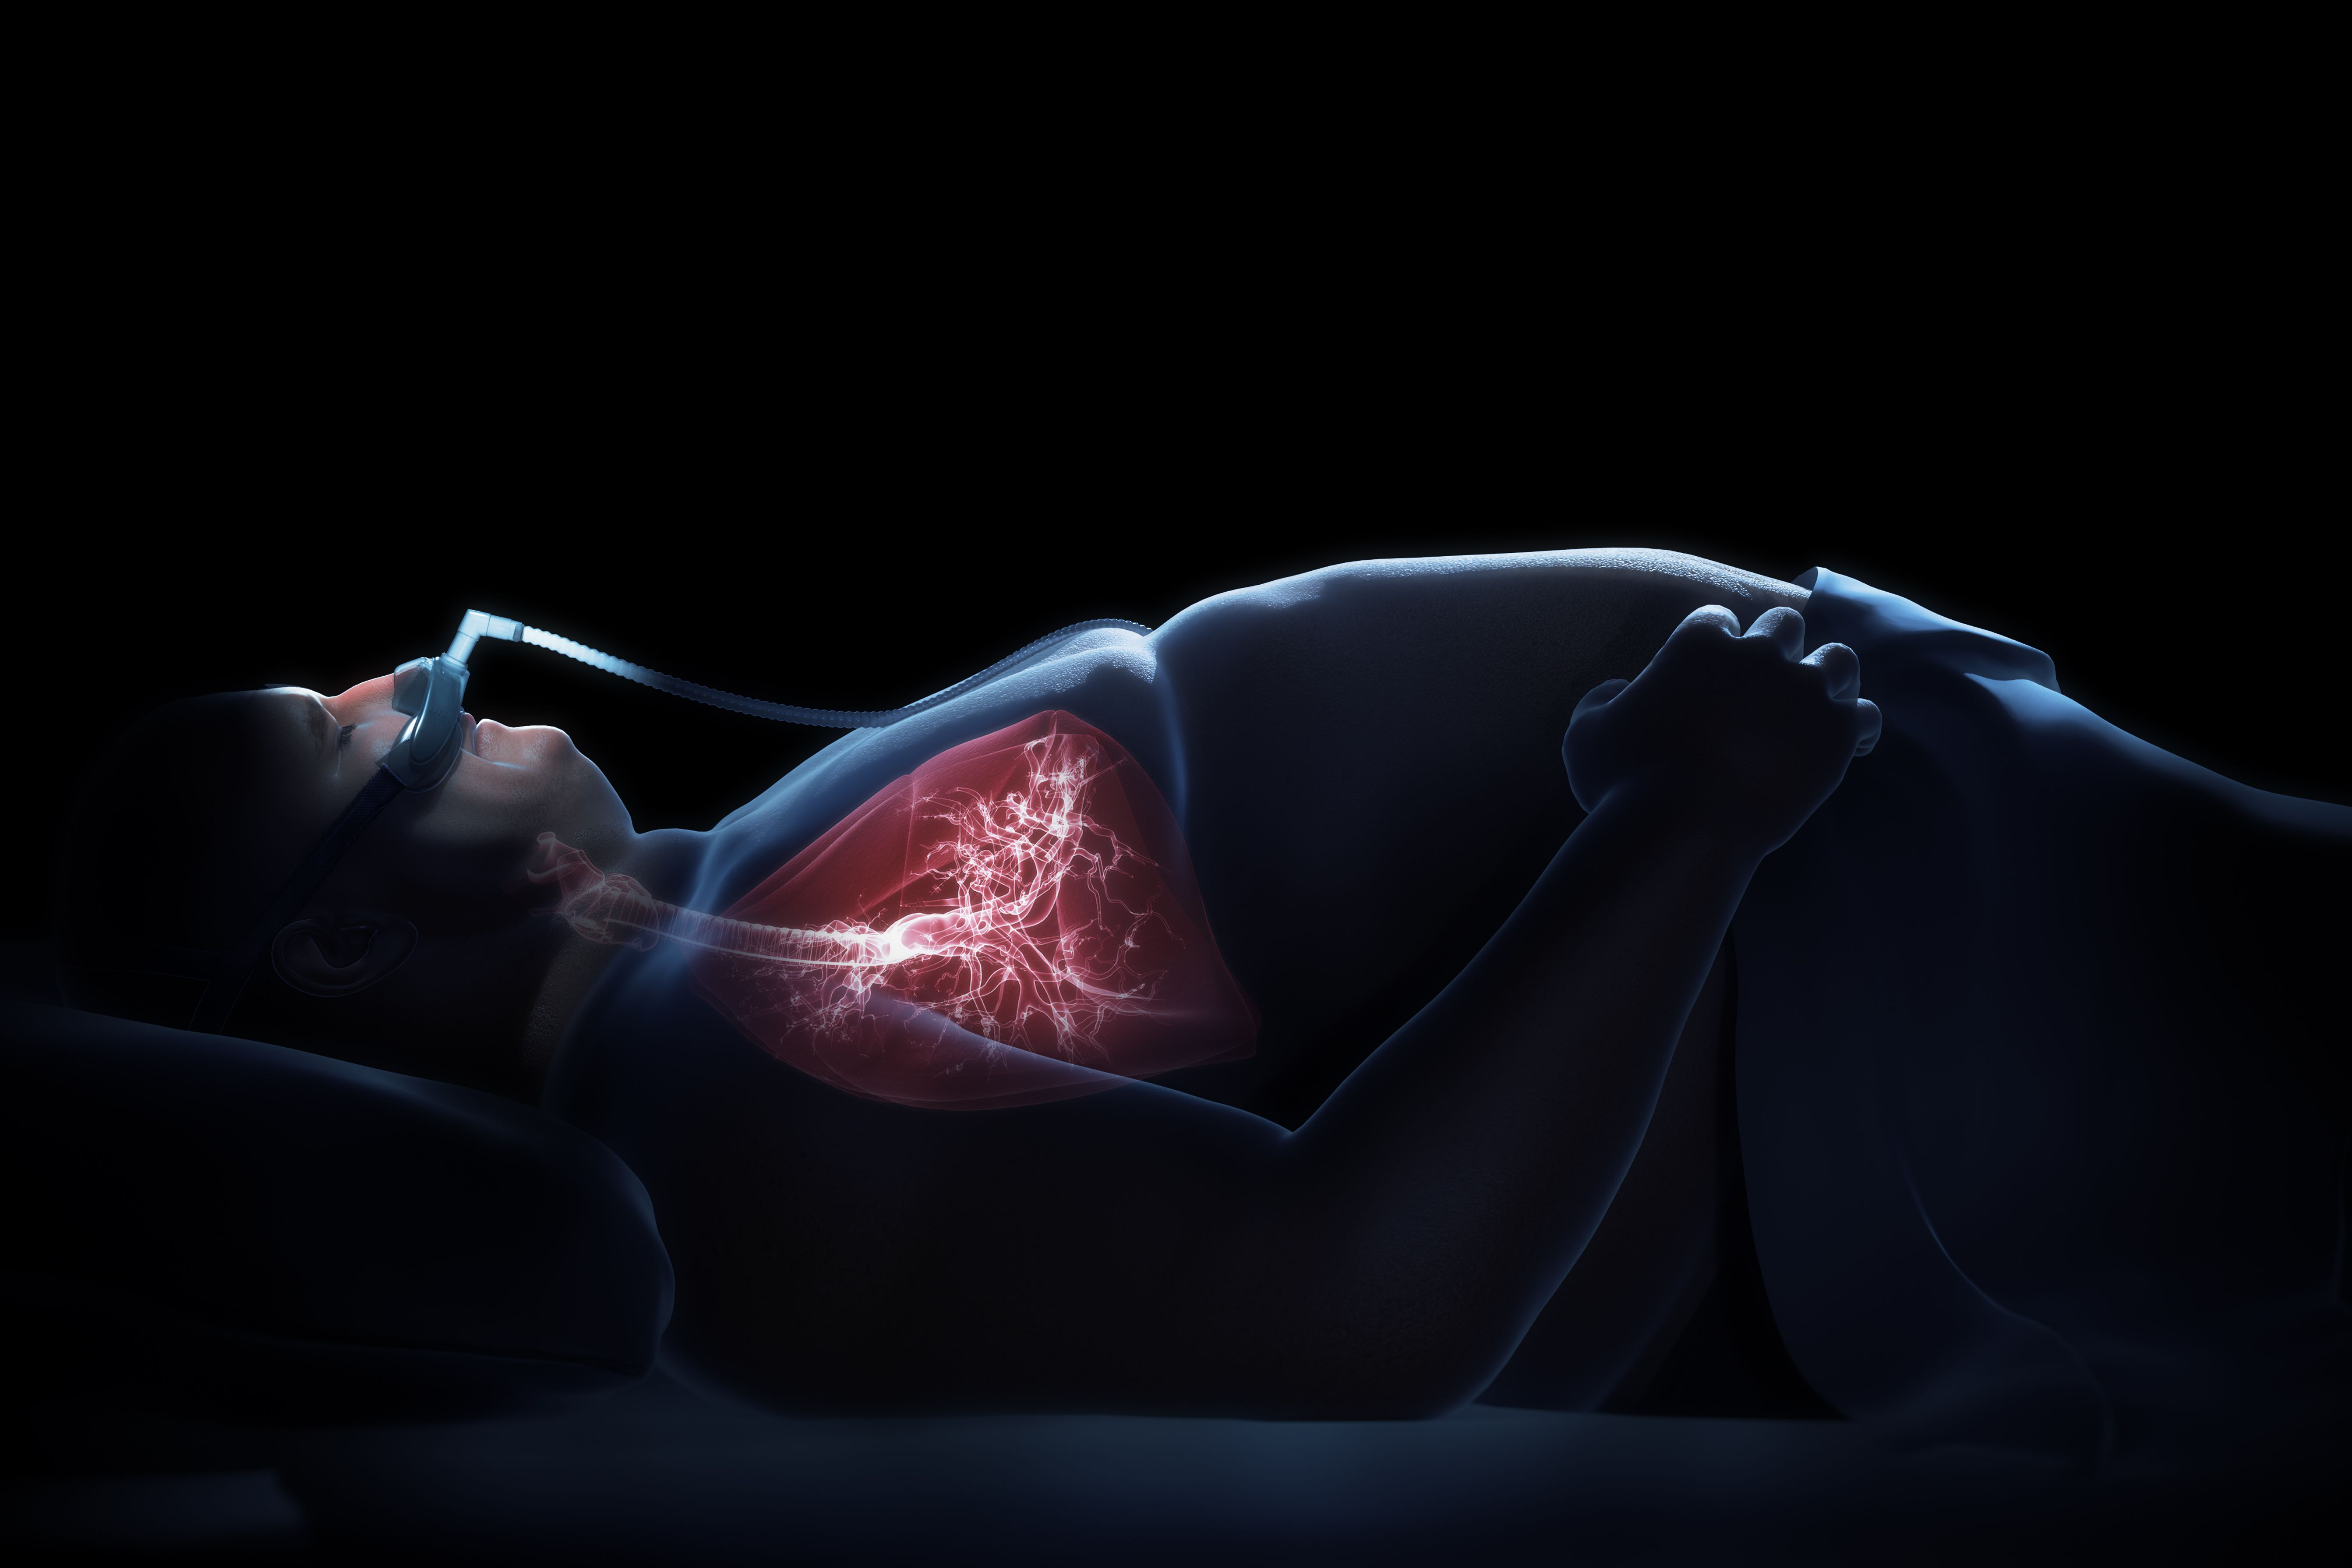 valium with sleep apnea